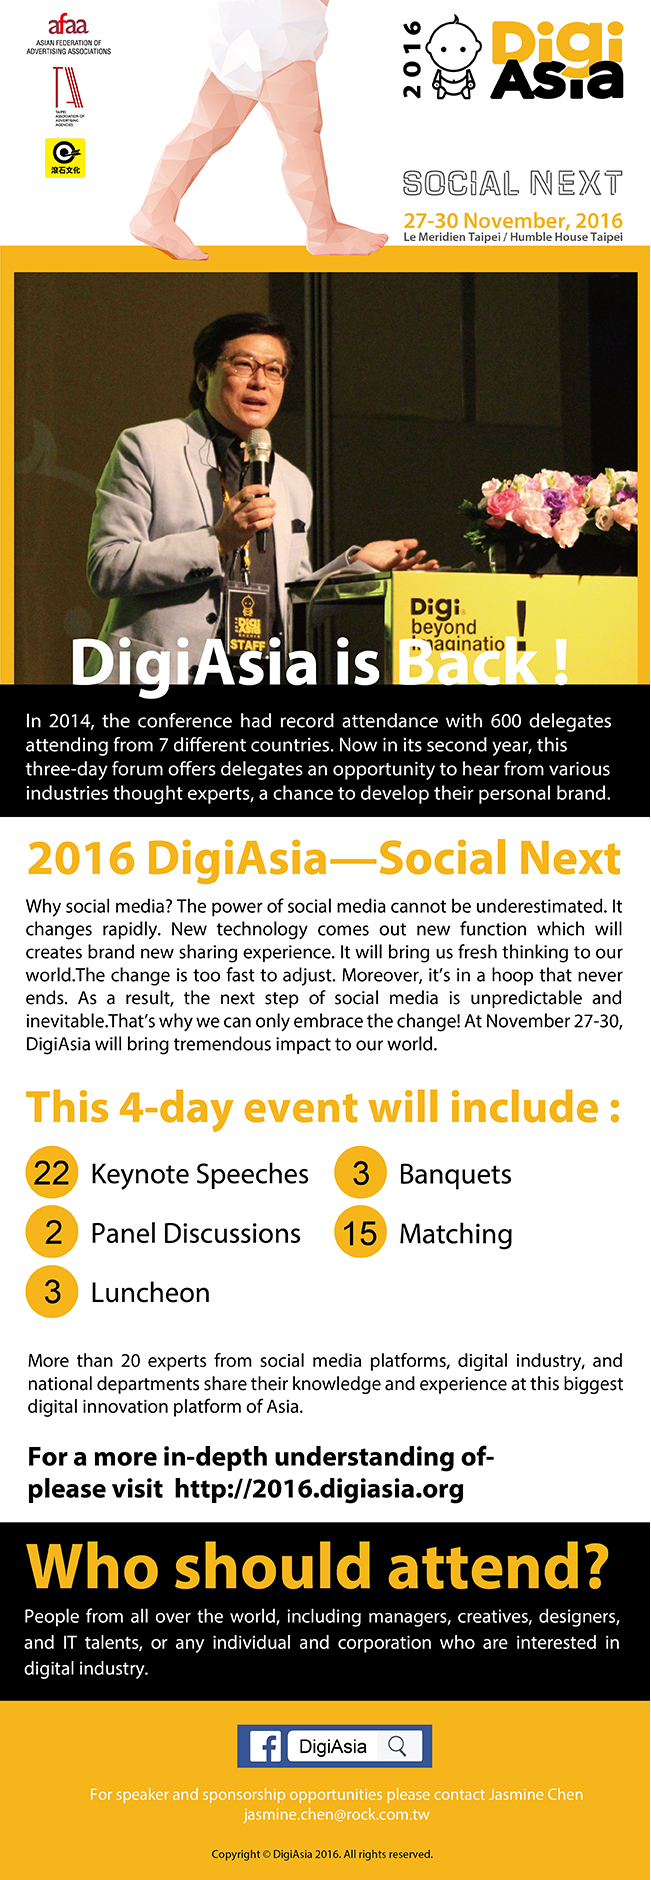 digi-asia-2016